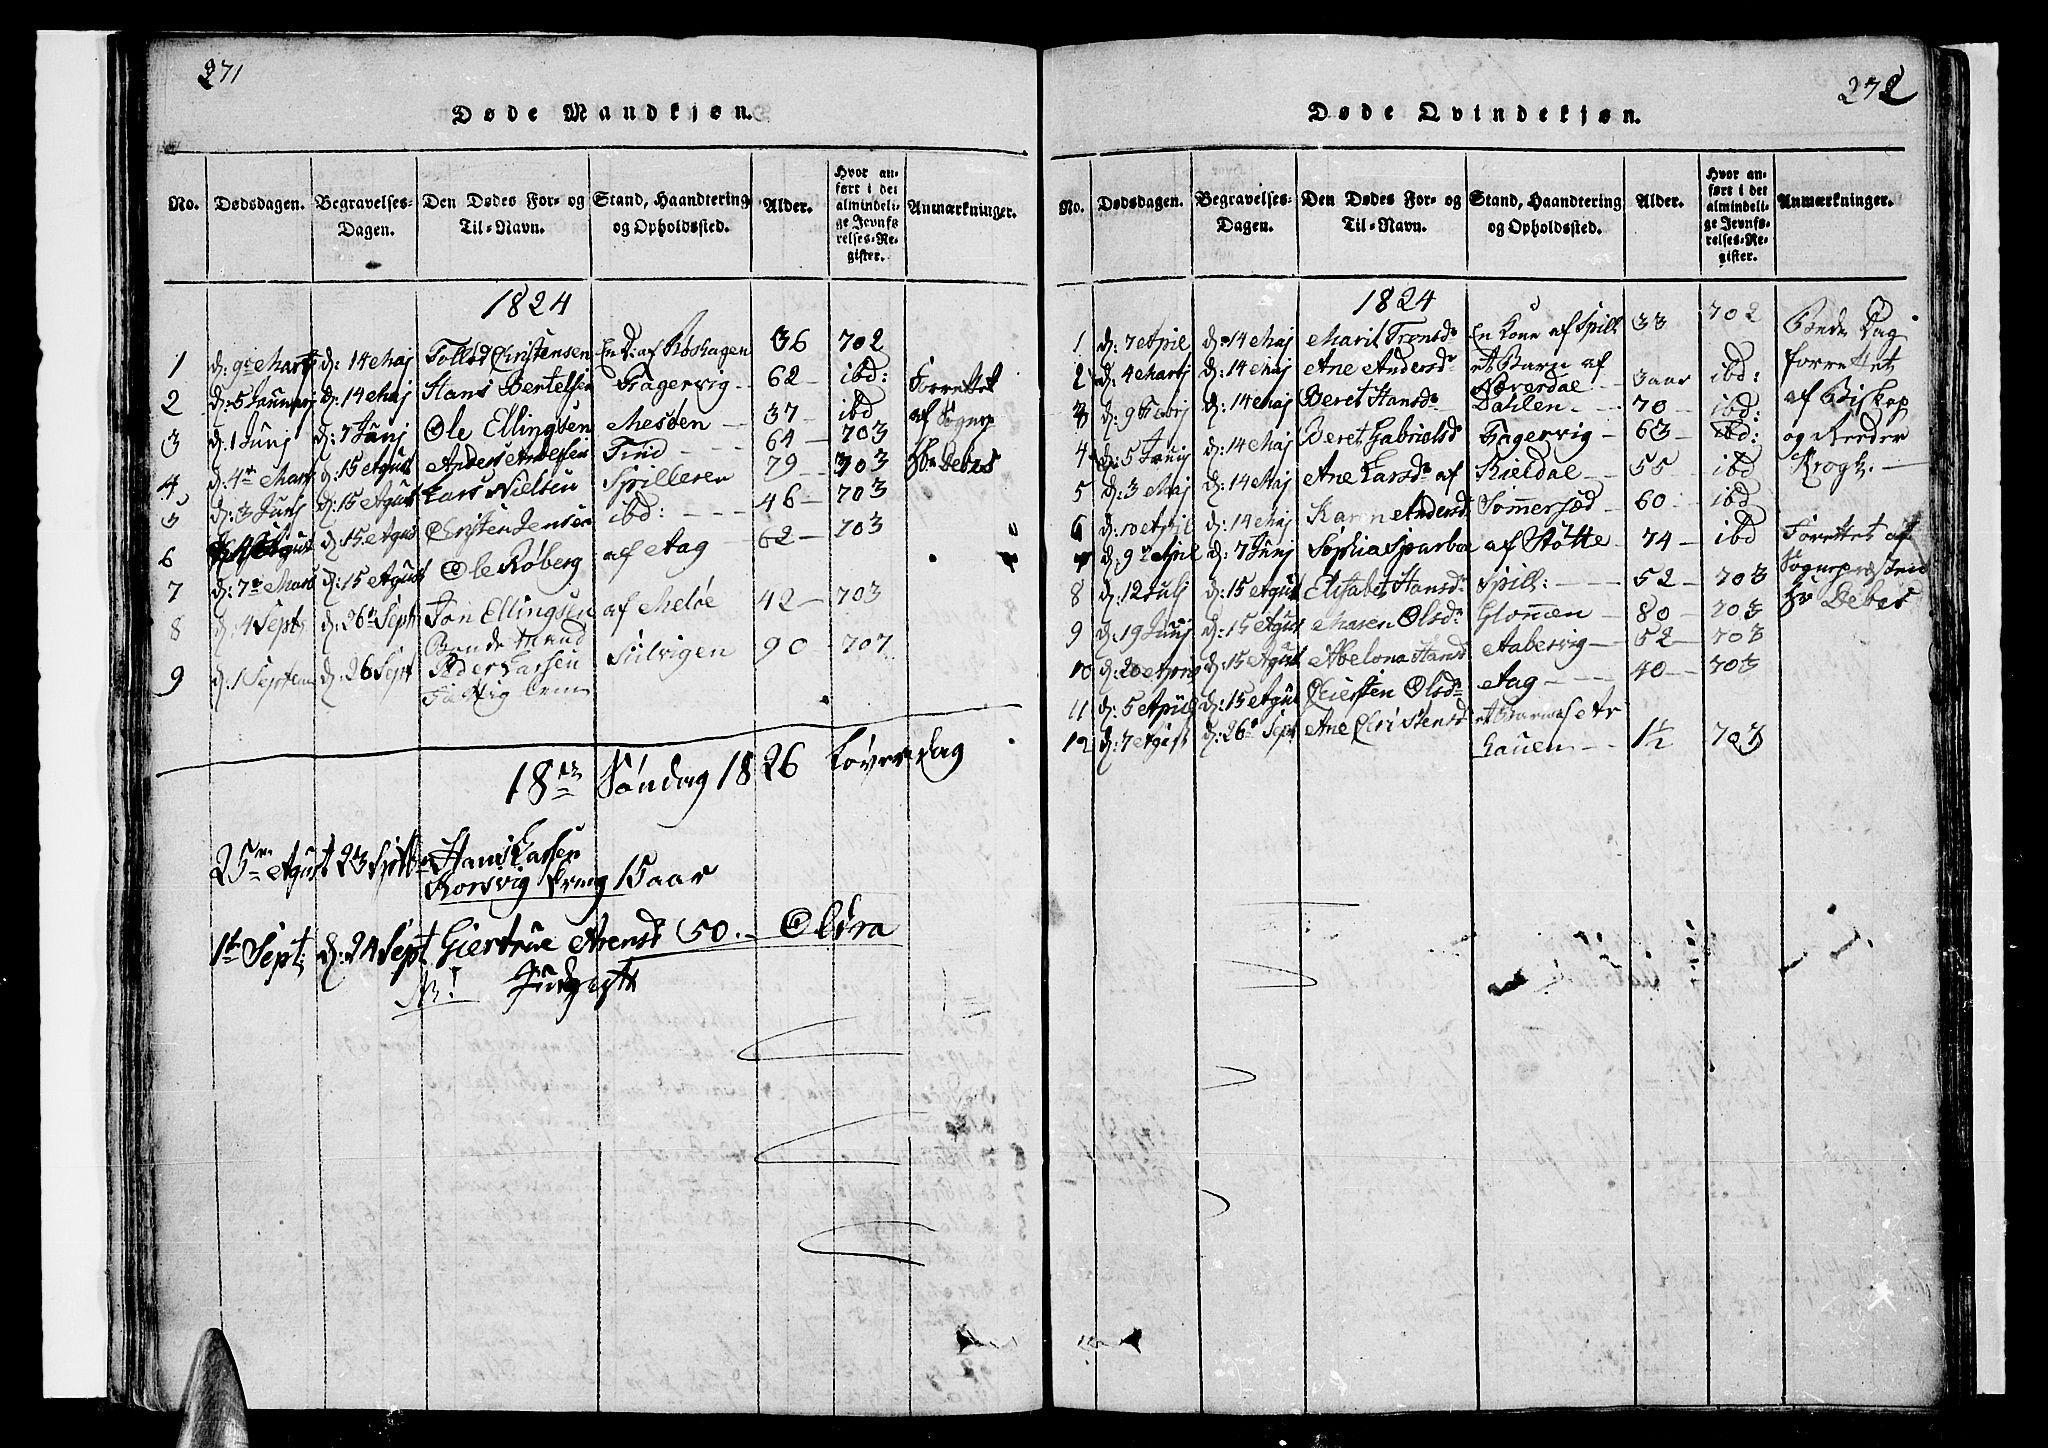 SAT, Ministerialprotokoller, klokkerbøker og fødselsregistre - Nordland, 841/L0617: Klokkerbok nr. 841C01 /2, 1820-1830, s. 271-272